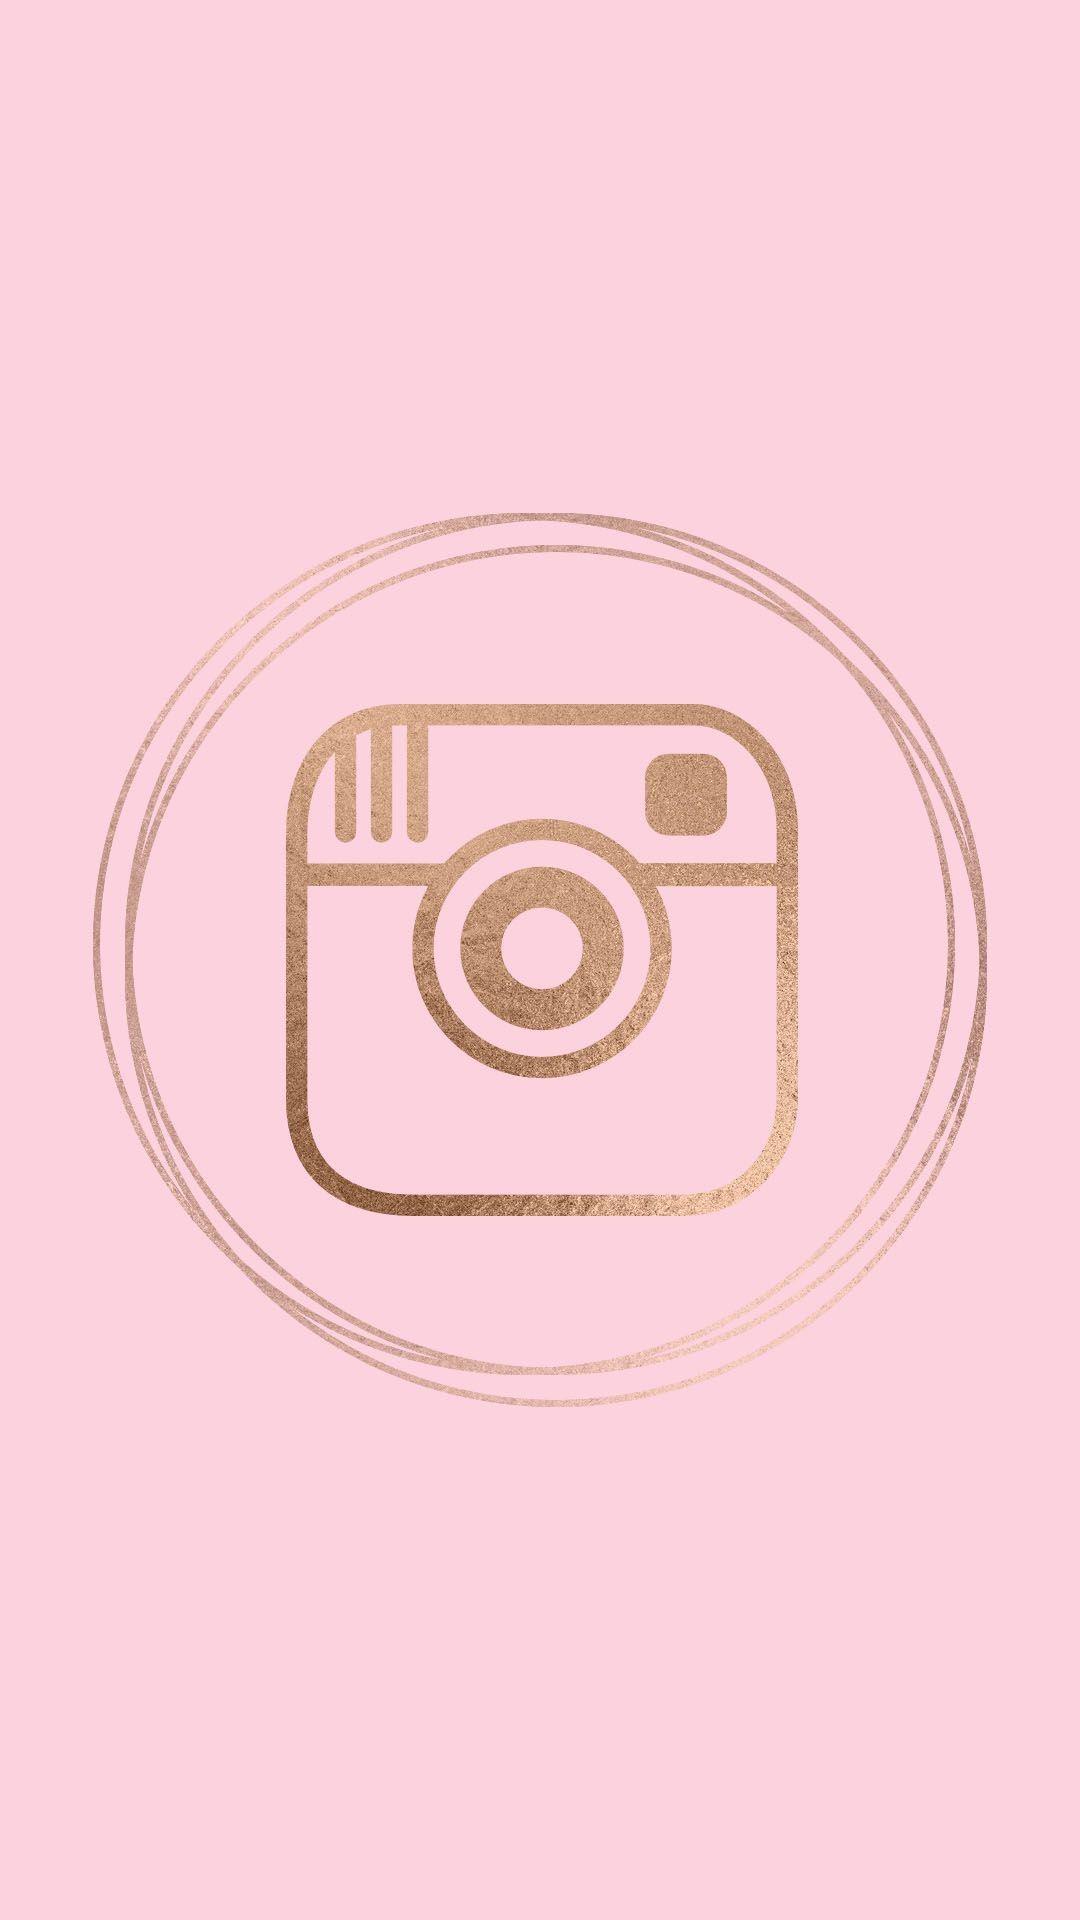 Pink Instagram Logo : instagram, CraftsandHobbyCo/Instagram, Instagram,, Instagram, Logo,, Highlight, Icons